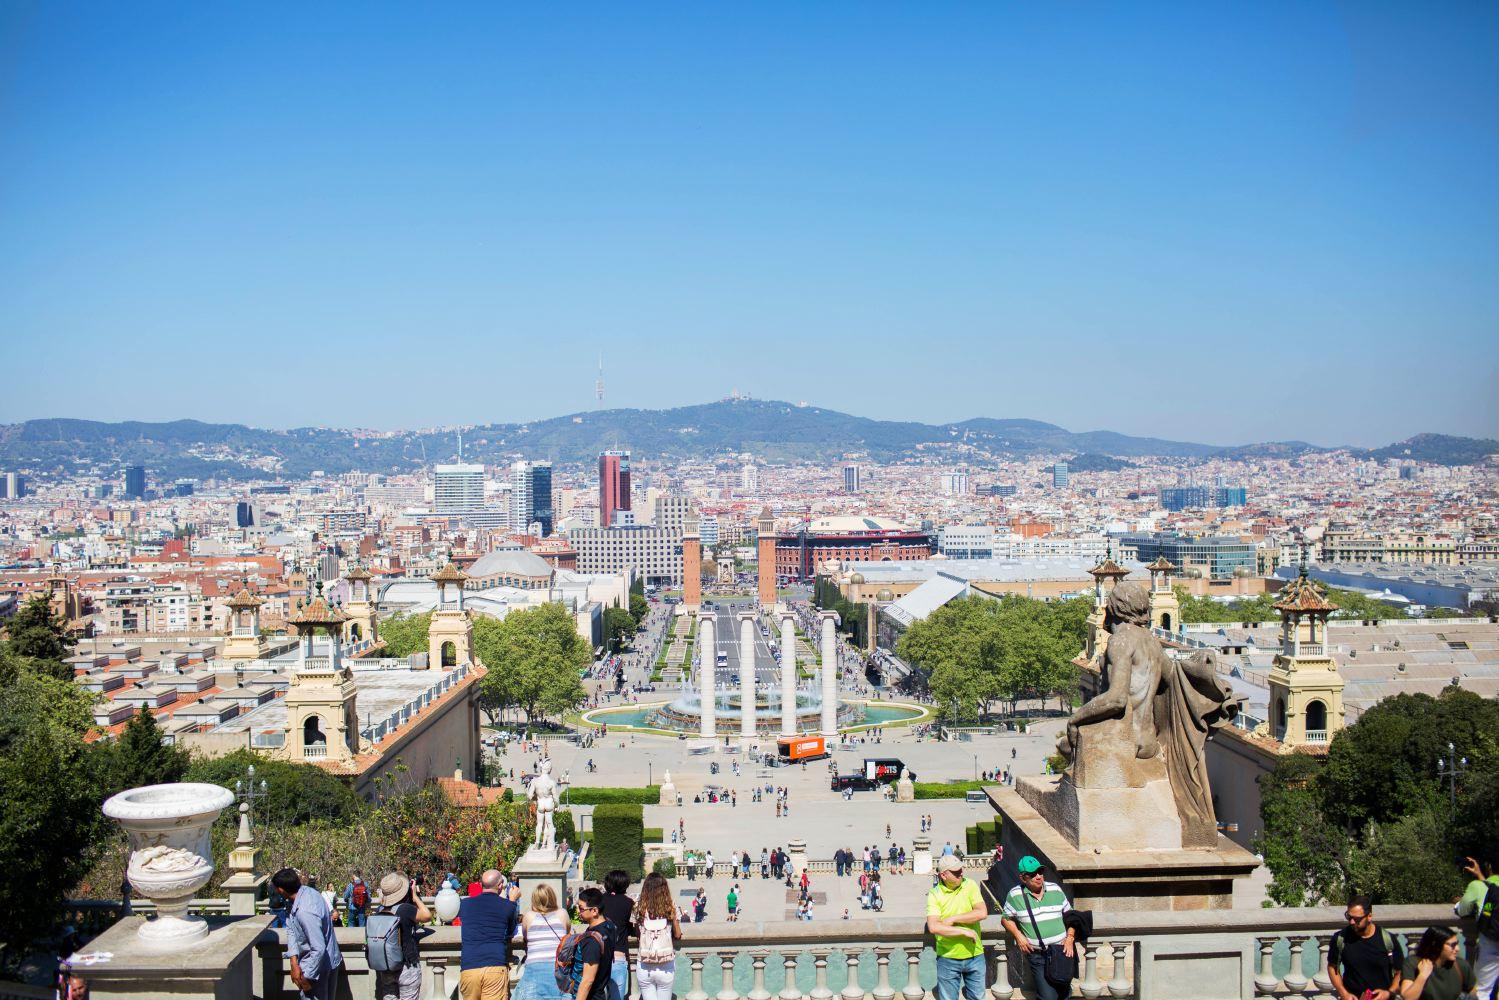 The view from the    Museu Nacional d'Art de Catalunya   .